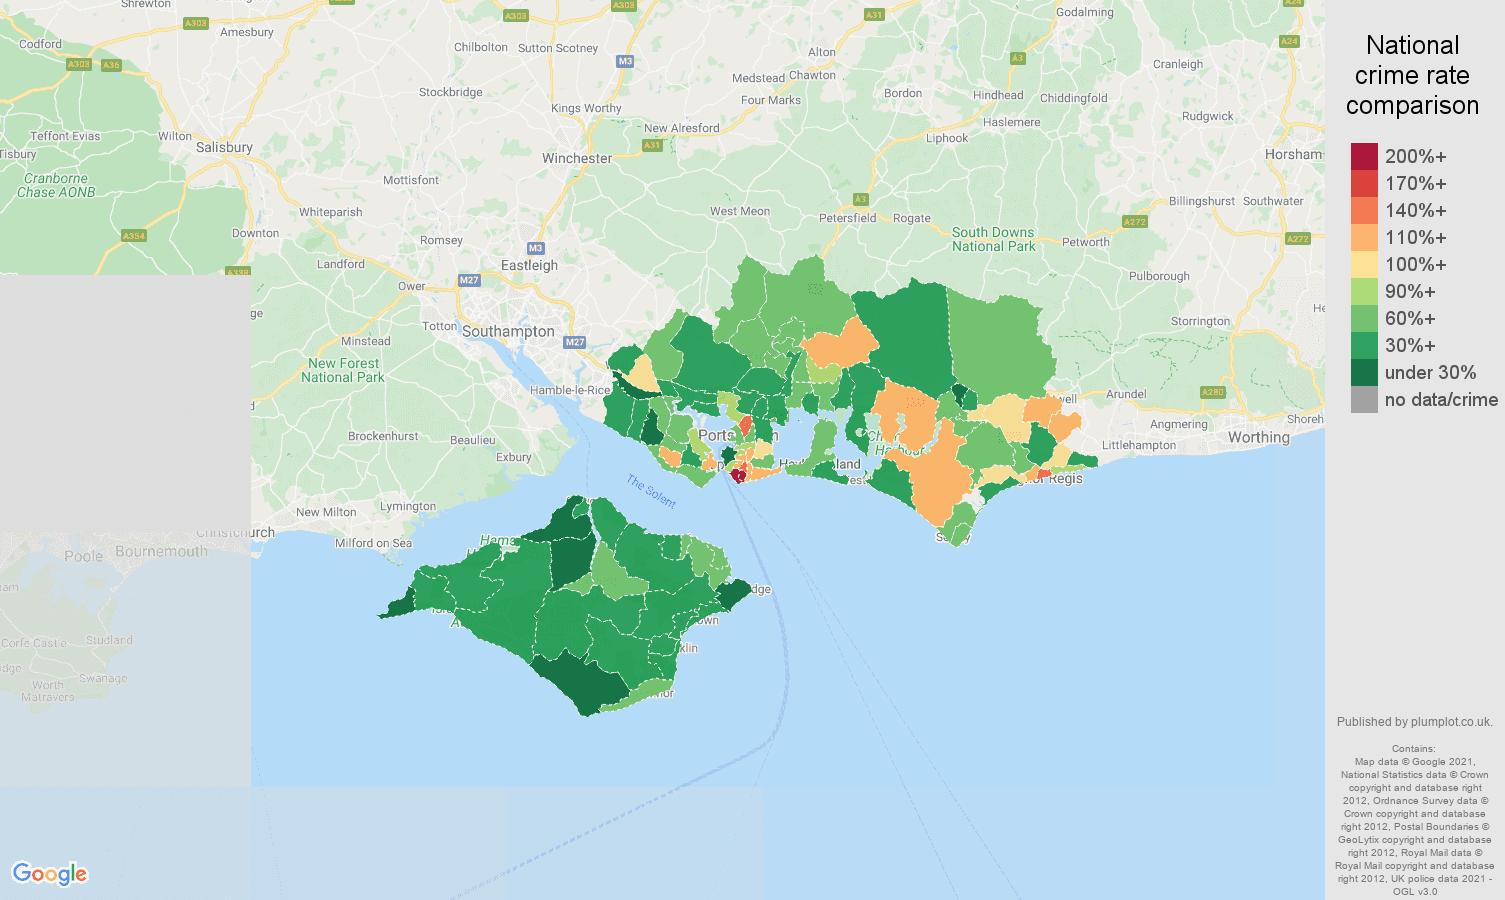 Portsmouth burglary crime rate comparison map